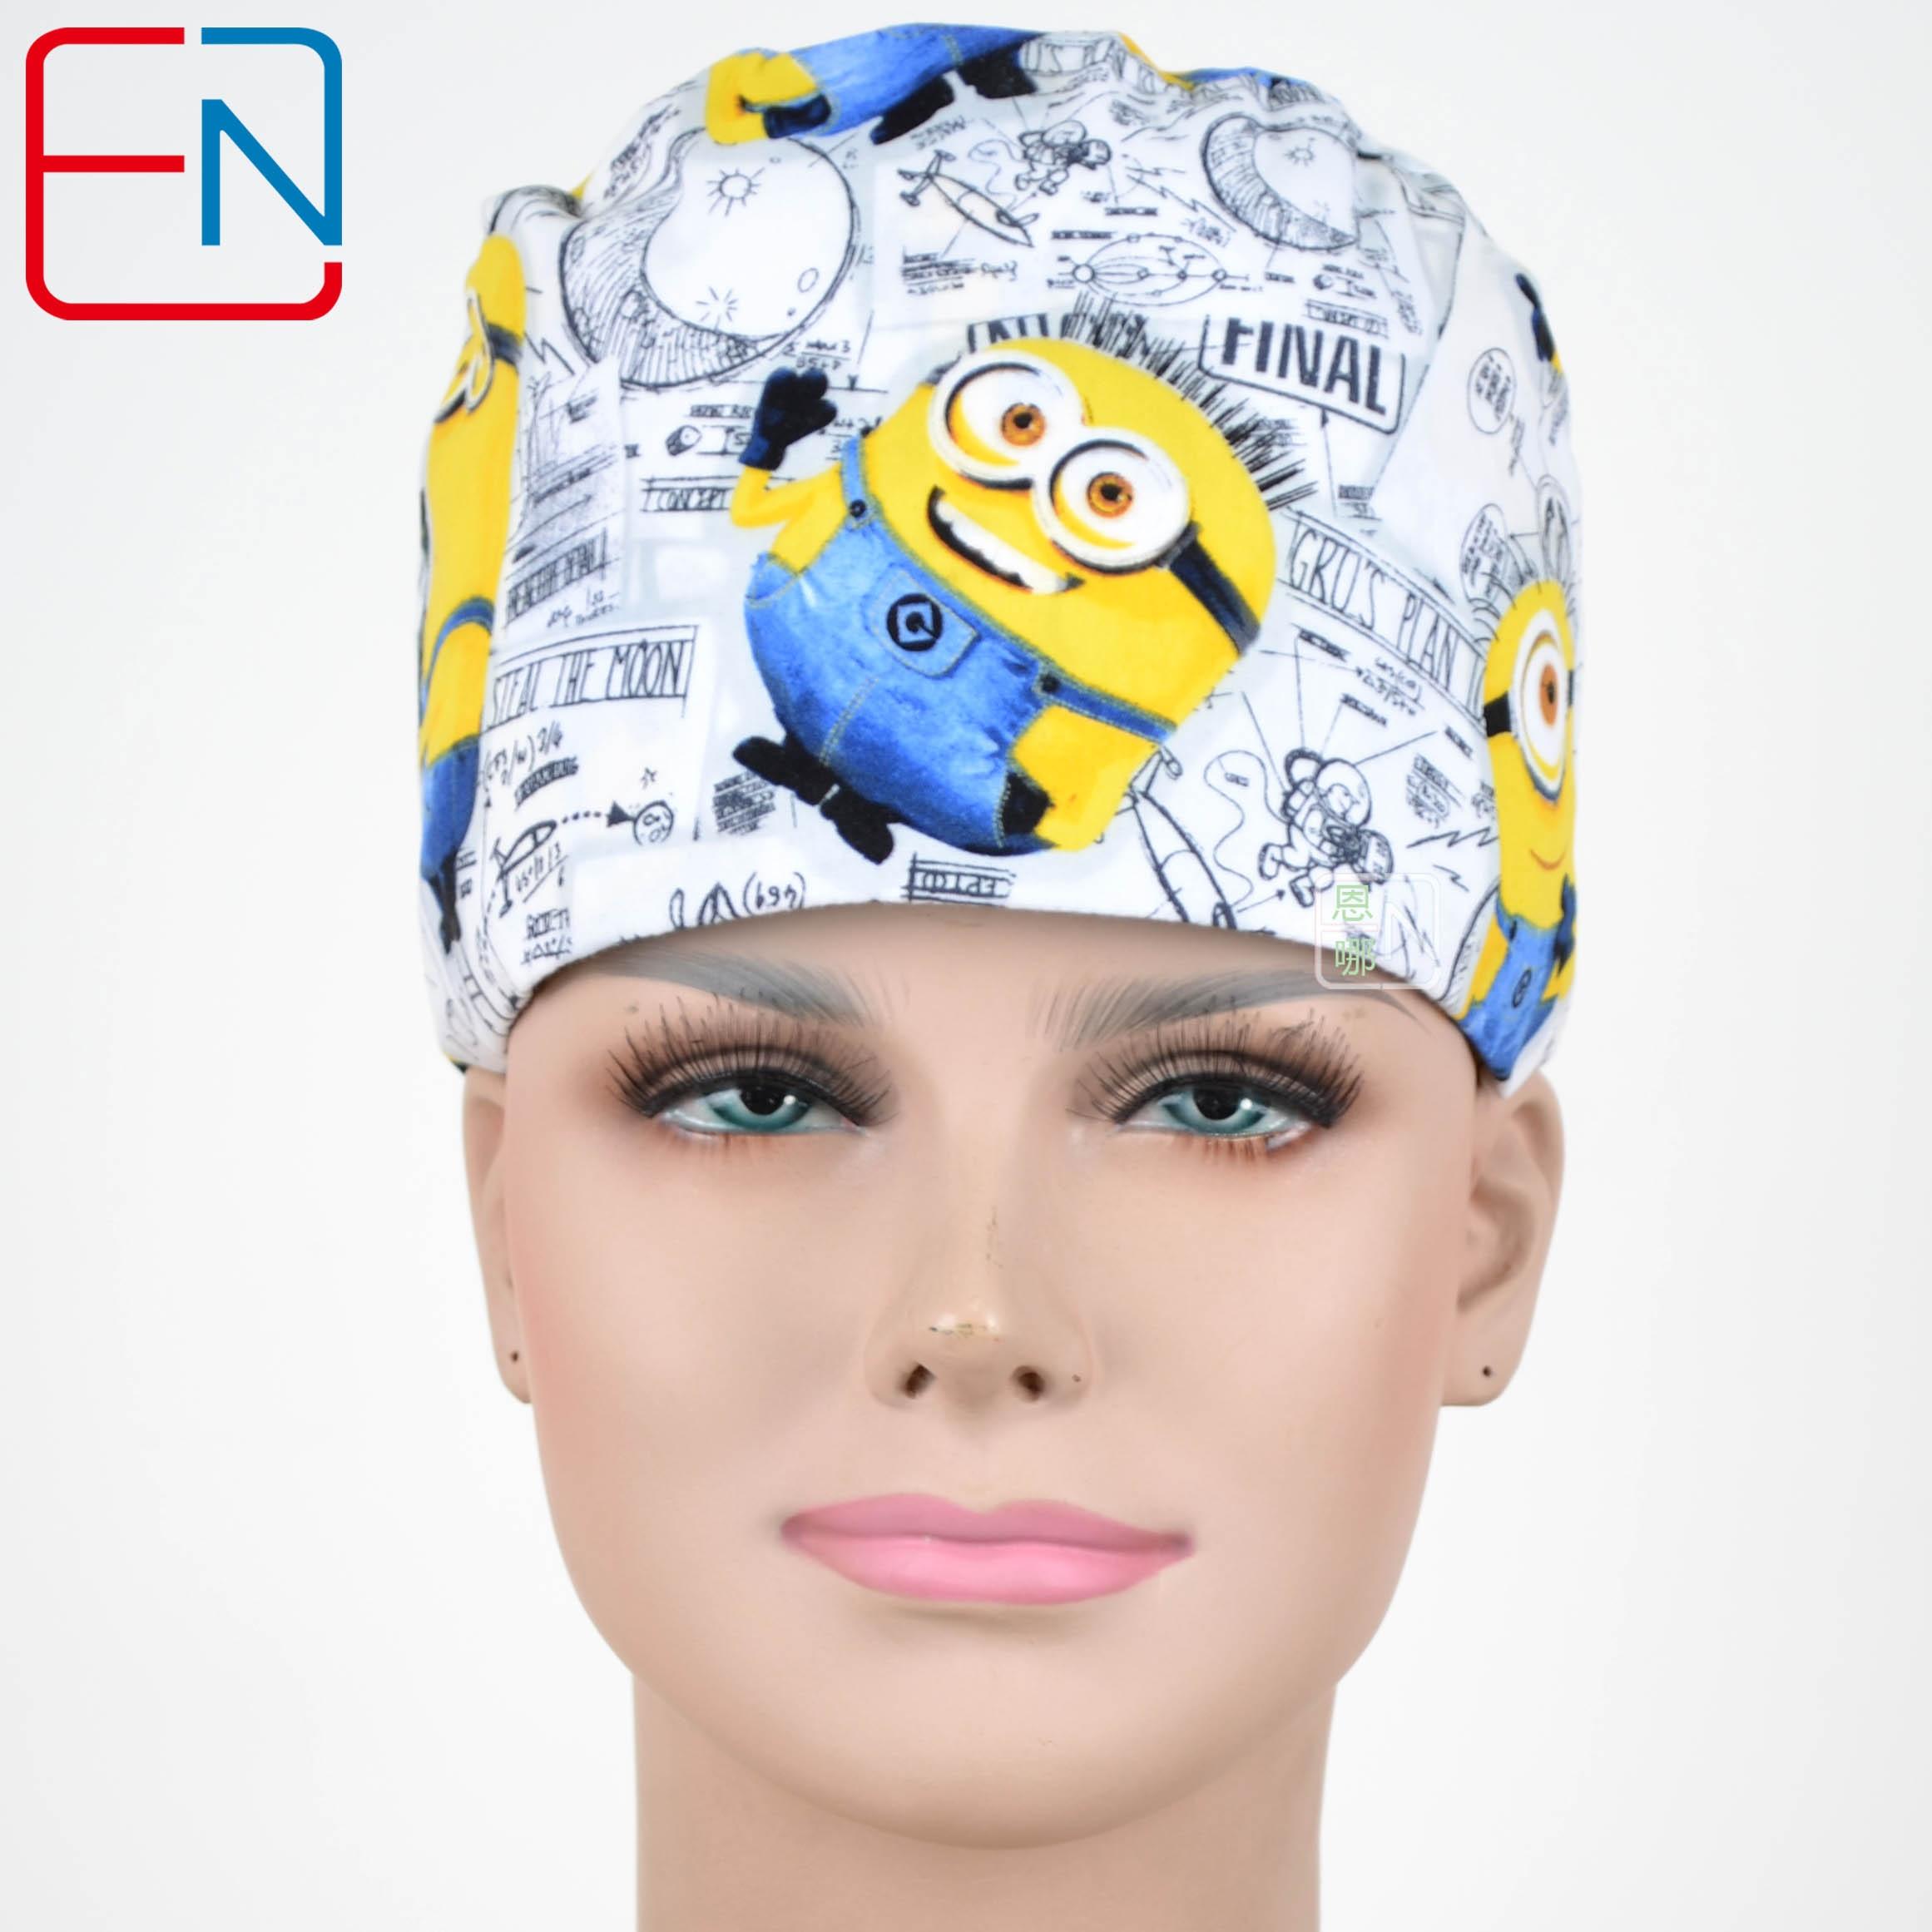 Hennar Medical Scrub Caps Surgical Caps In 100% Cotton